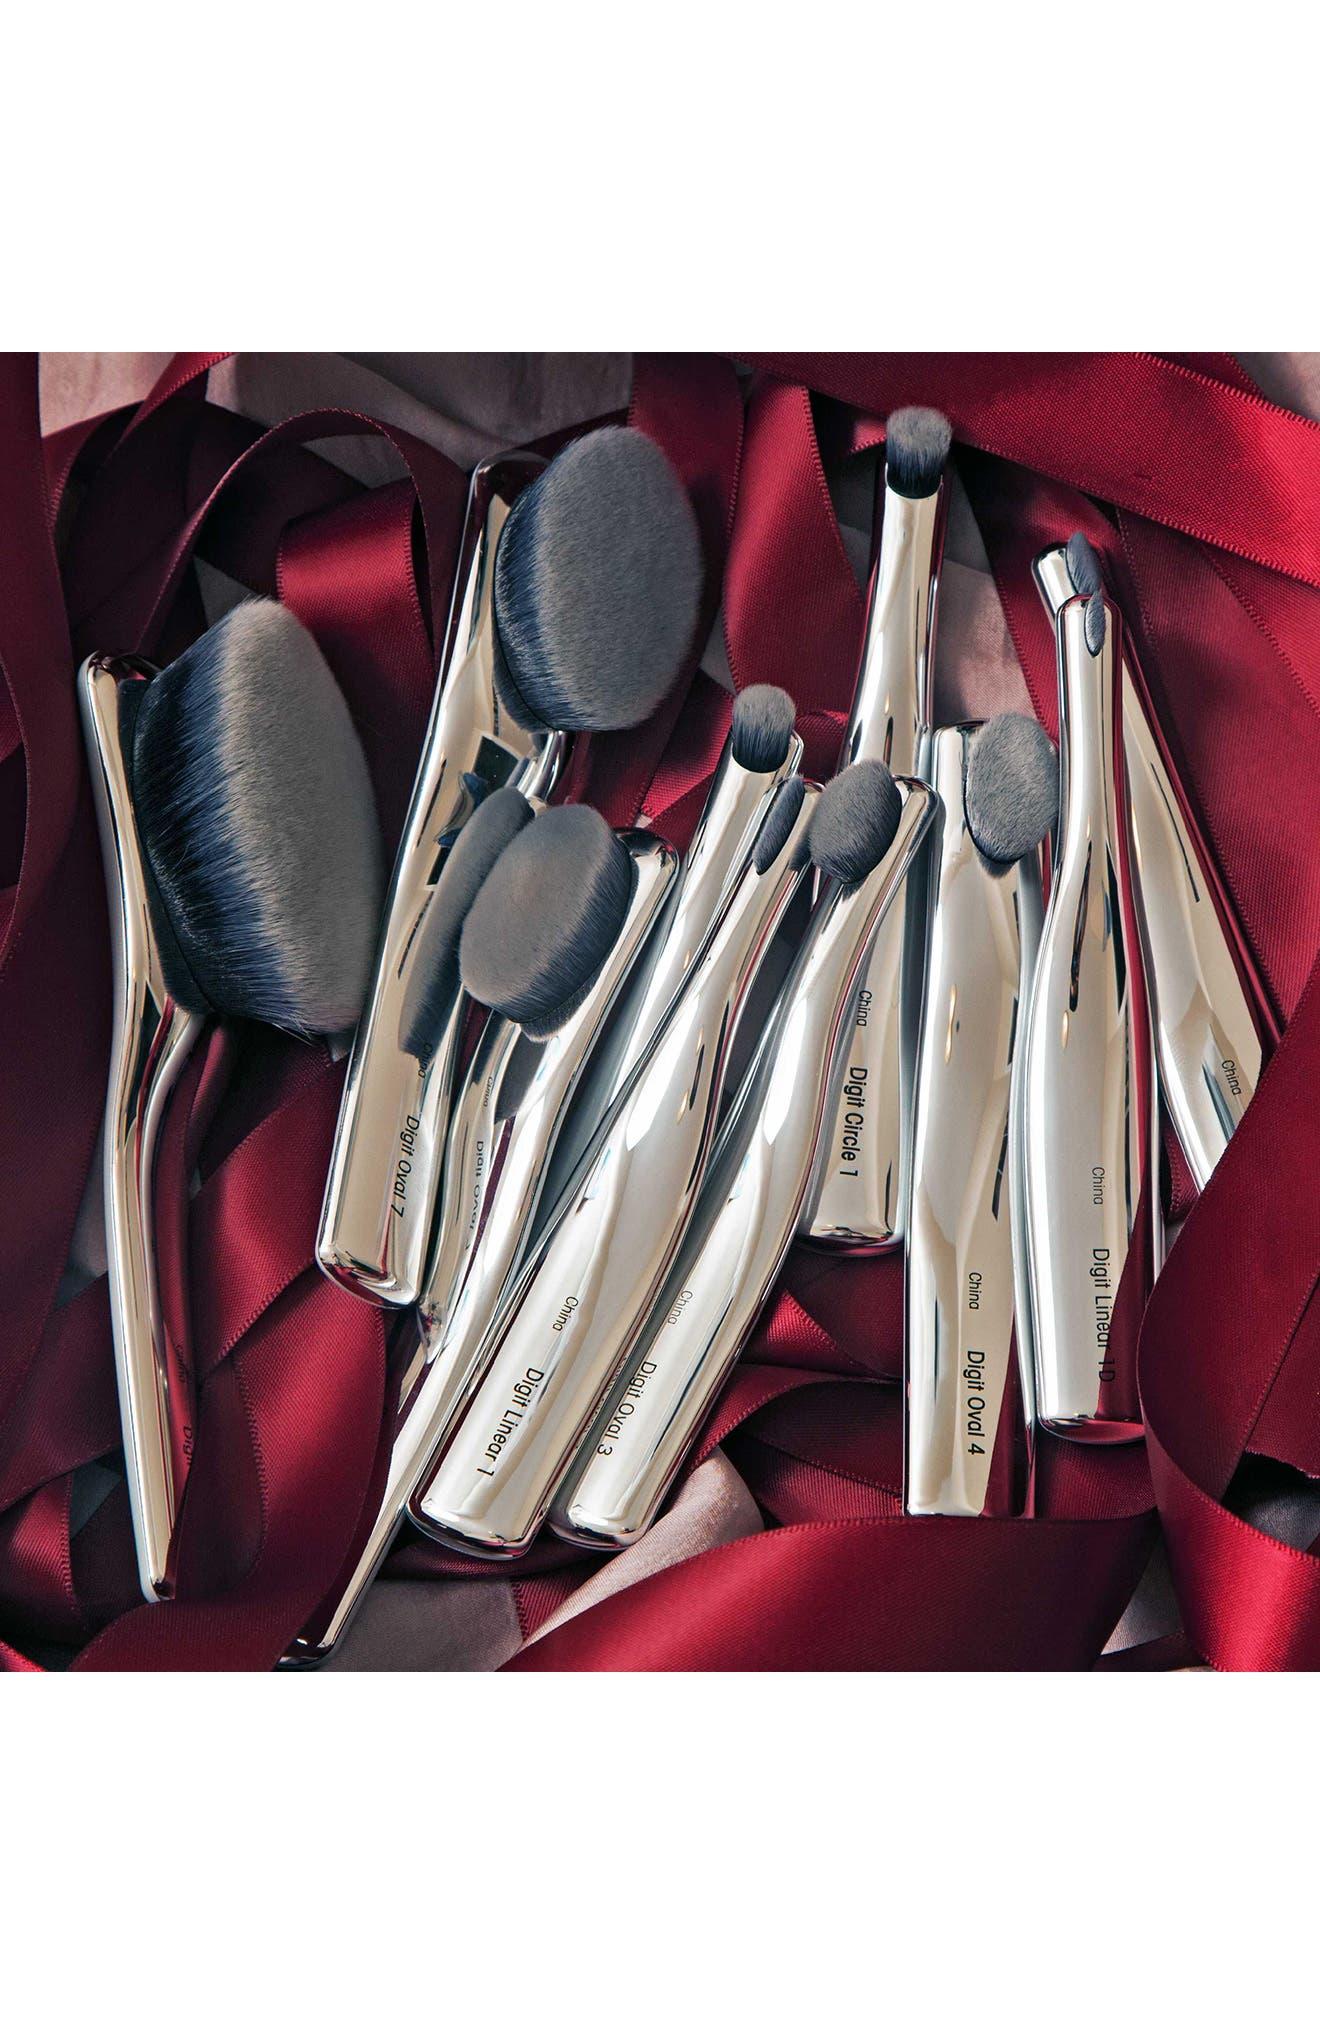 The Digit 10 Brush Set in Luxury Case,                             Alternate thumbnail 4, color,                             000